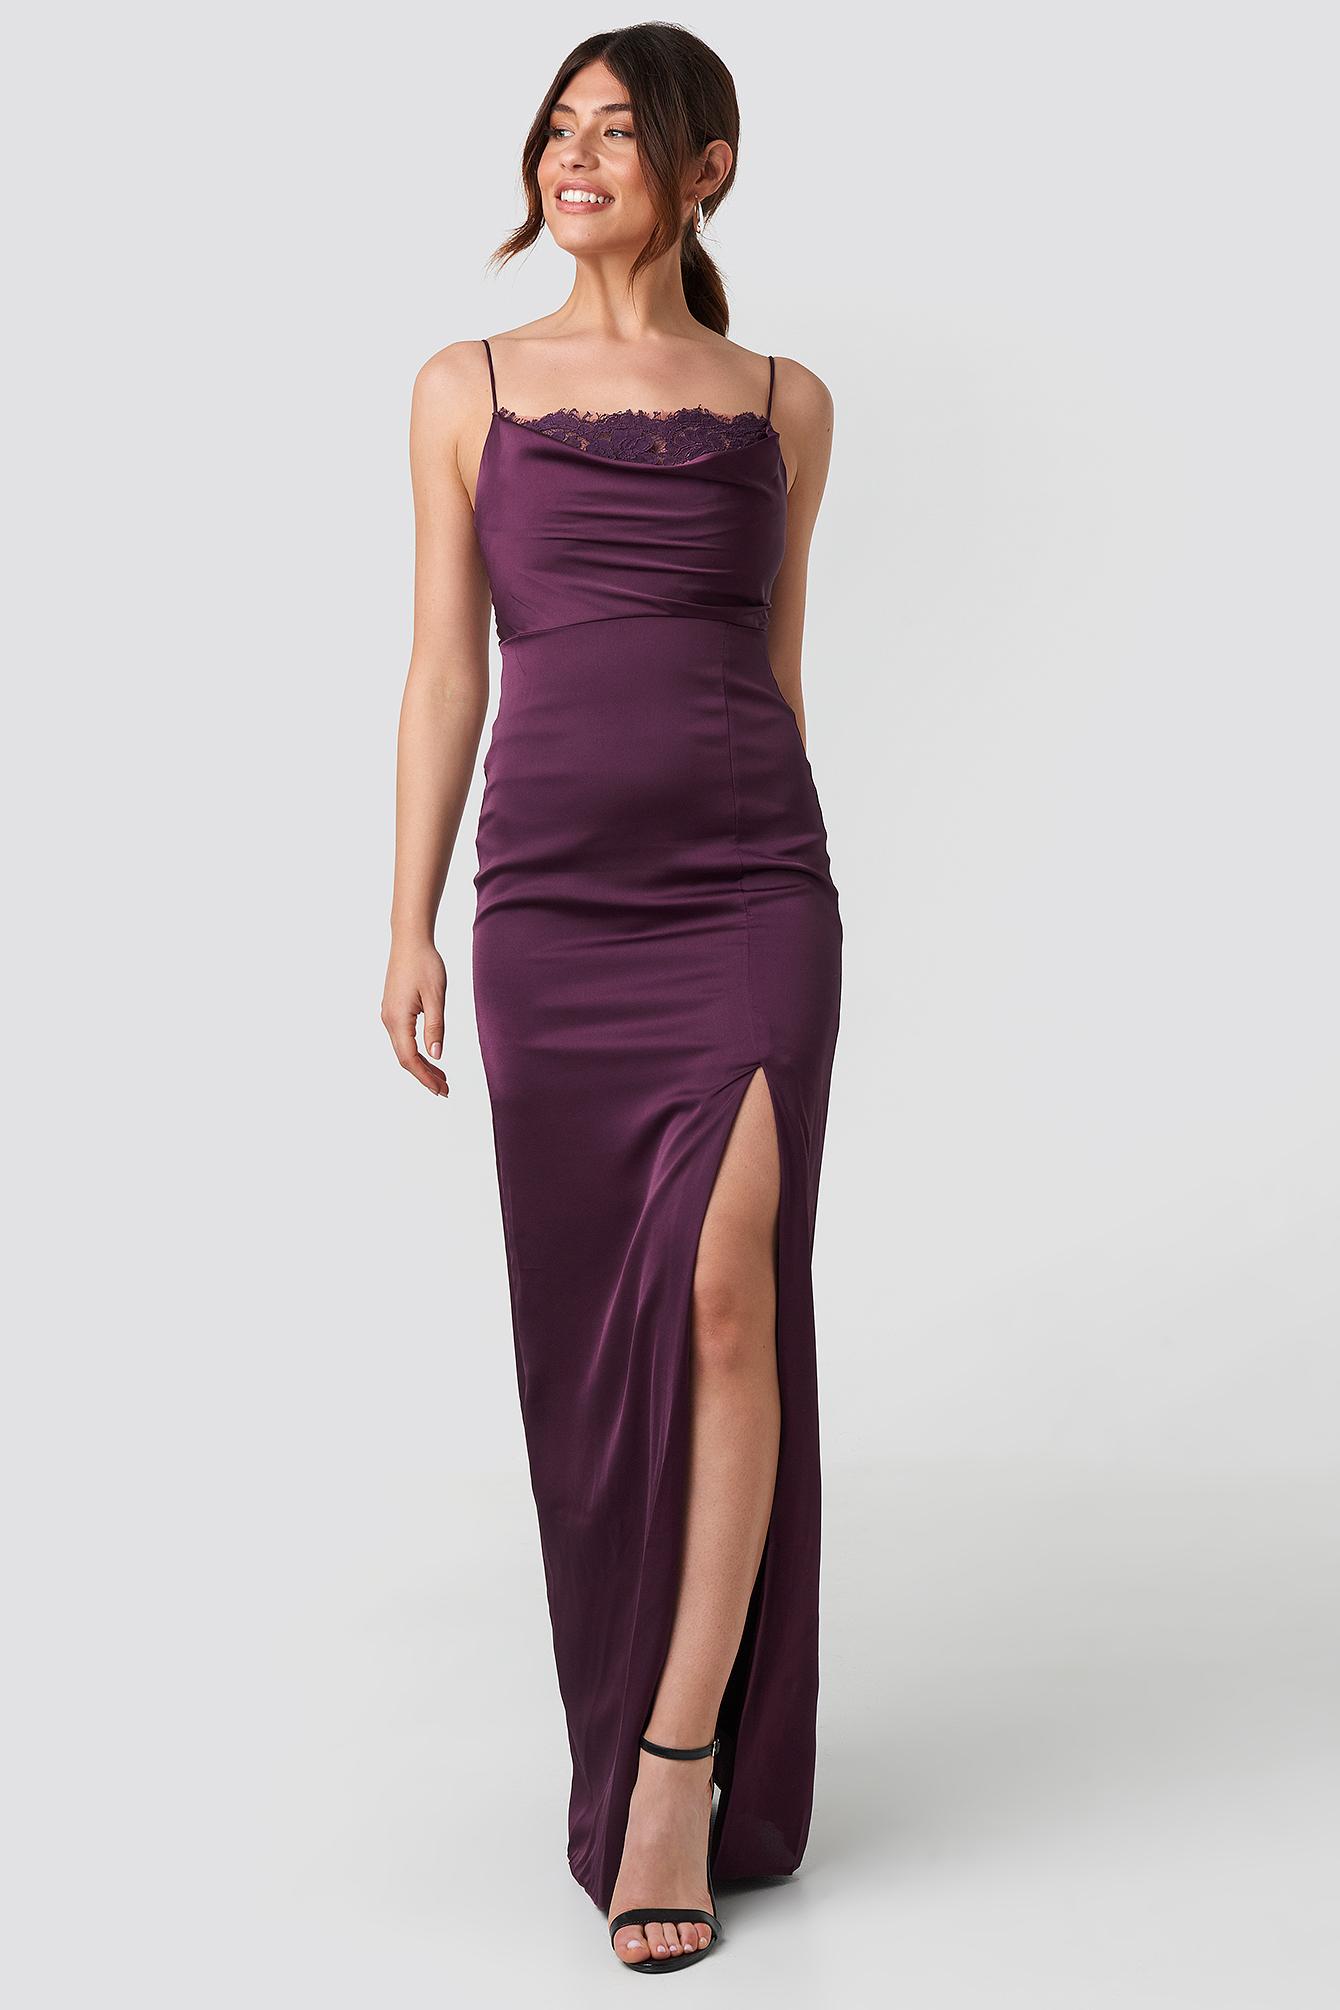 cde5fd072f60b Lace Detailed Evening Dress - Purple in Damson